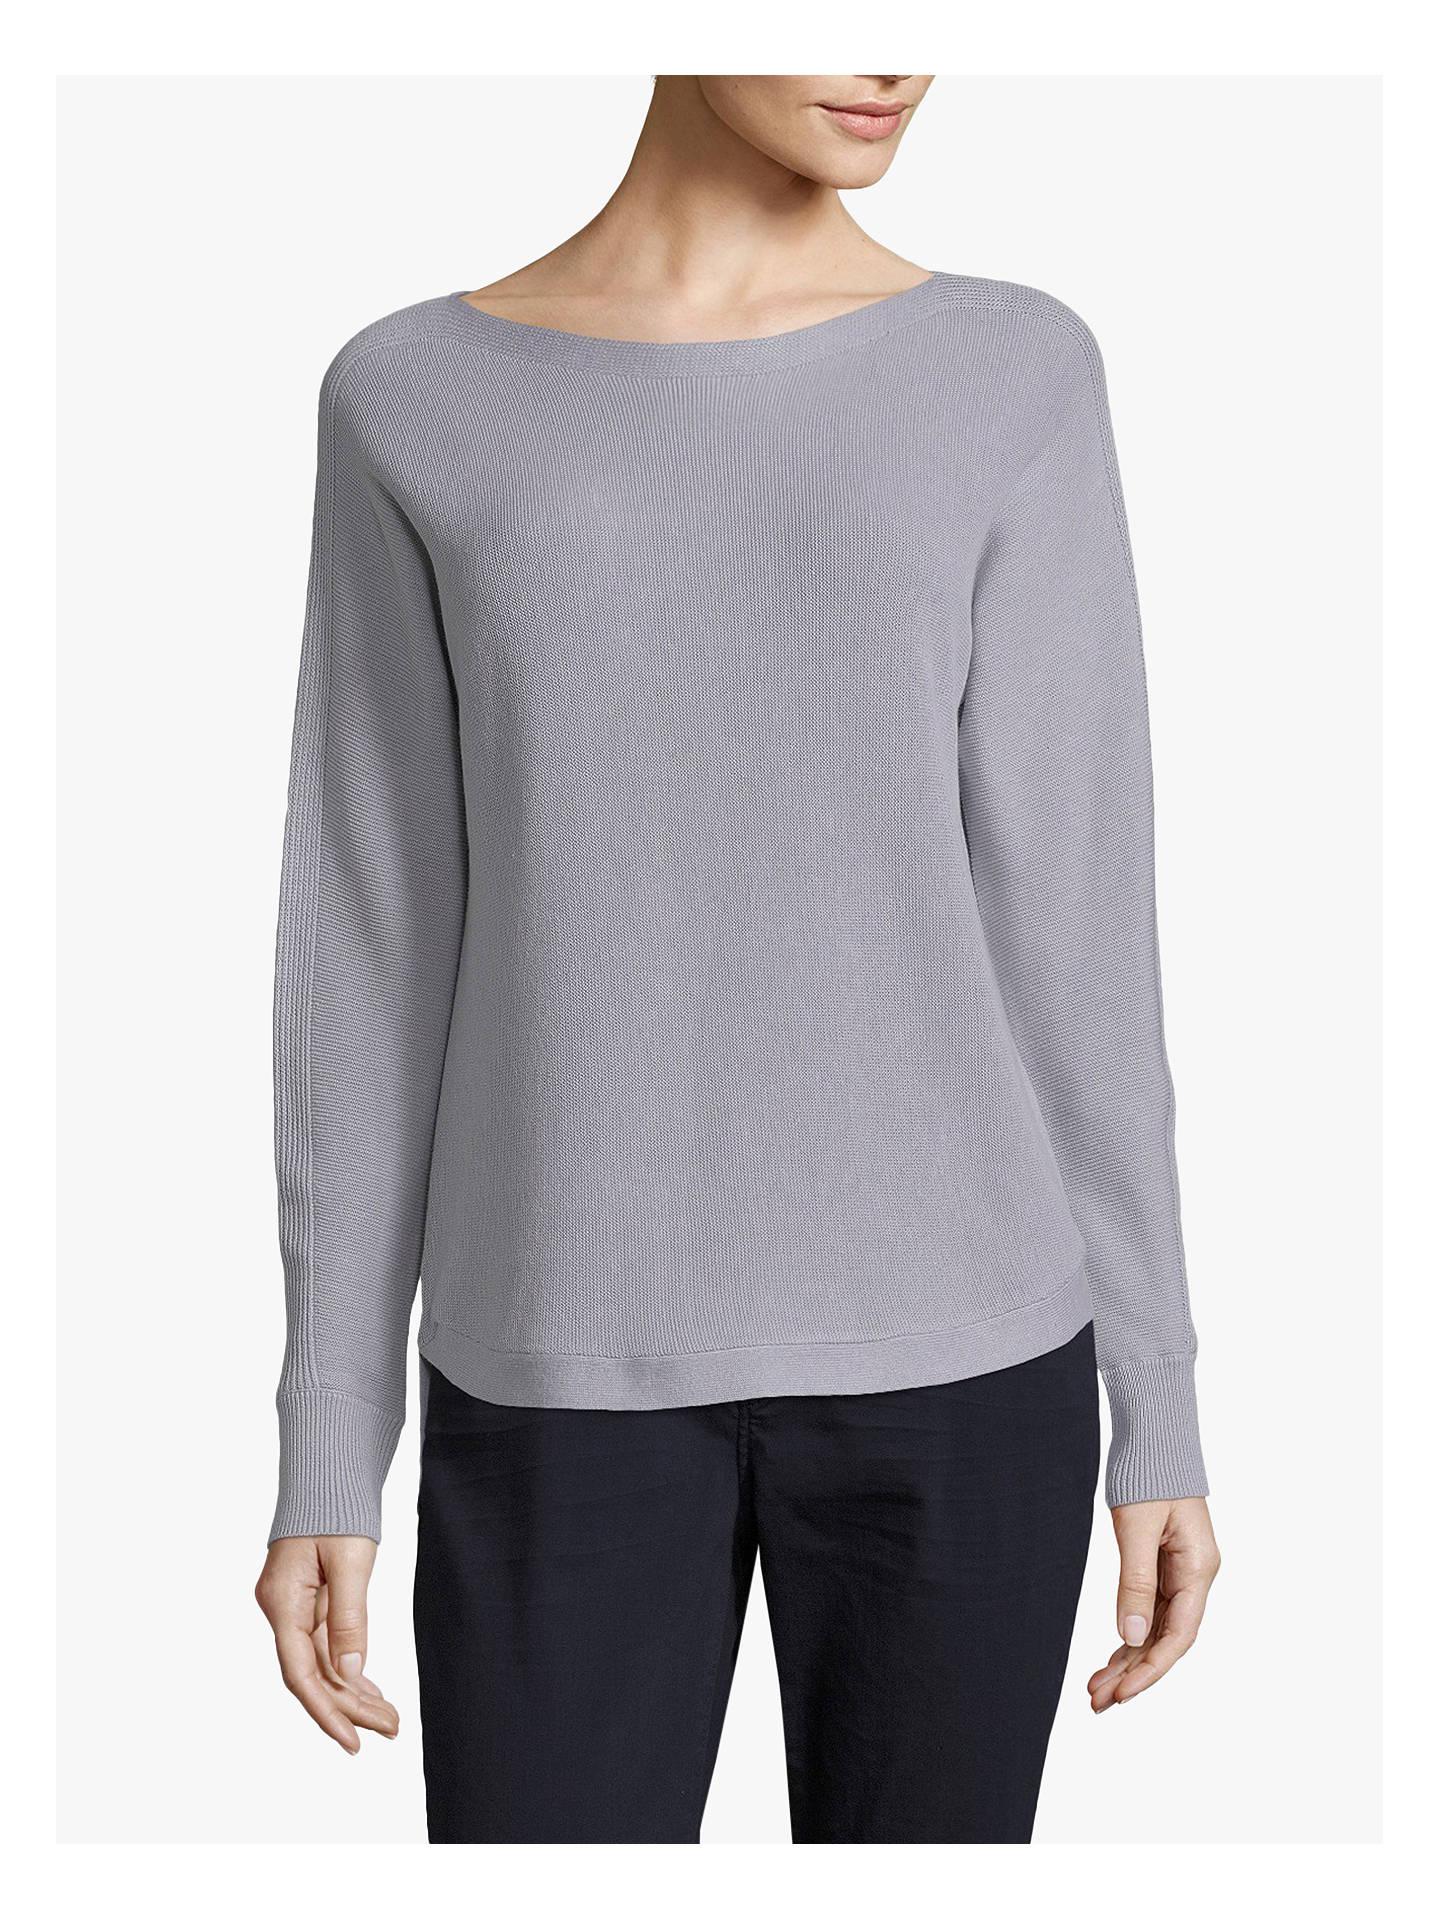 Betty Barclay Long Sleeve Knit Jumper at John Lewis   Partners e9306720f